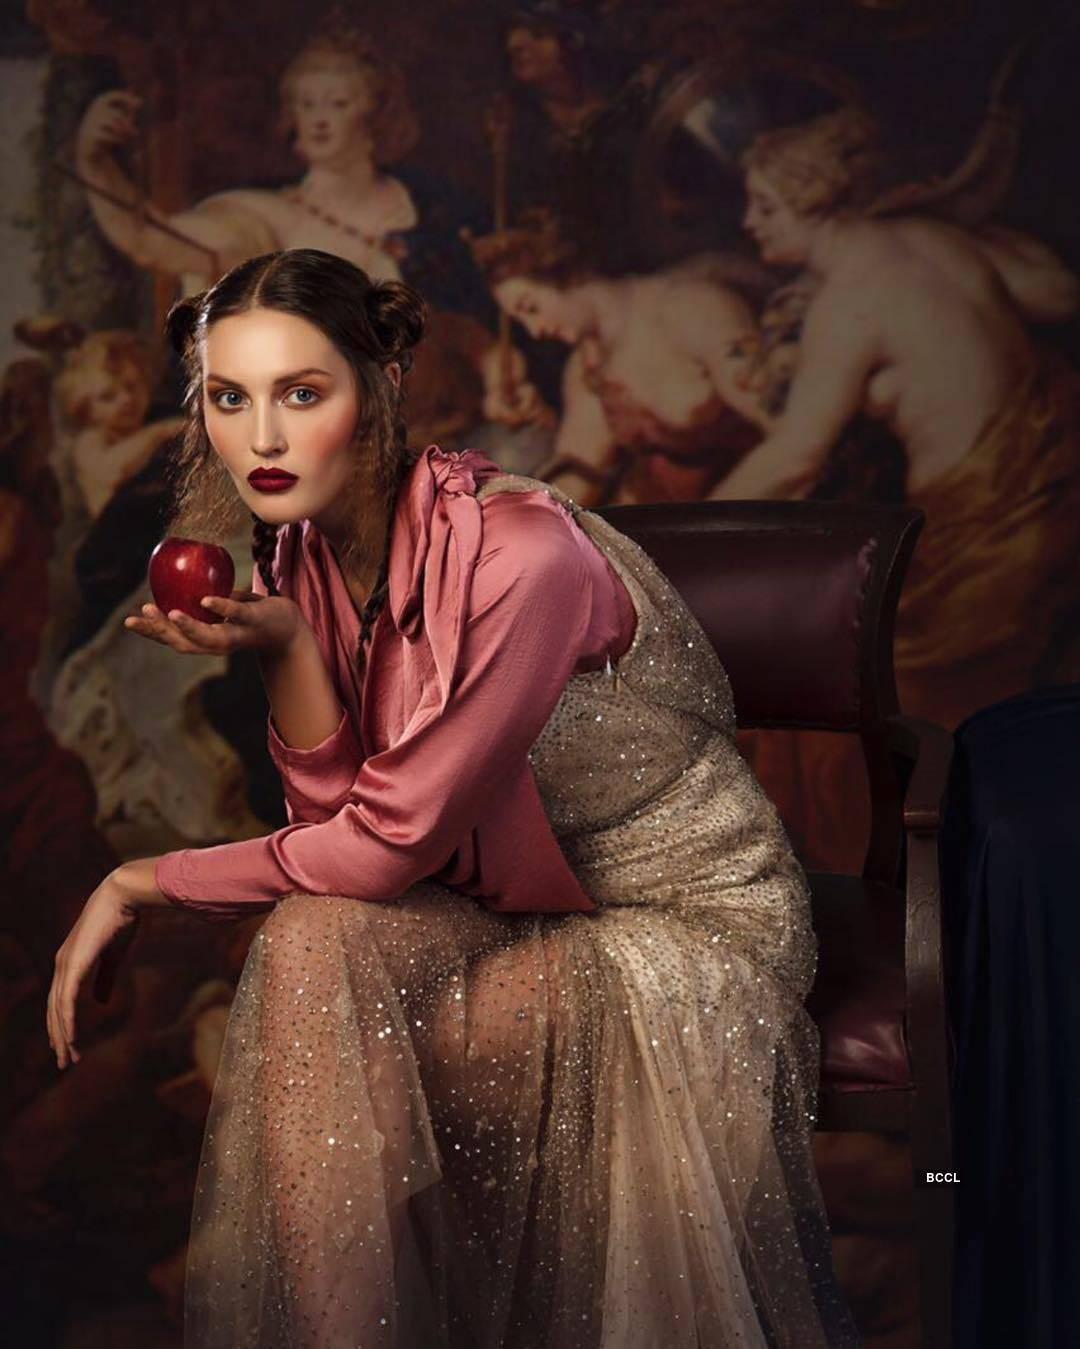 Kristina Mostovaya goes bold on social media